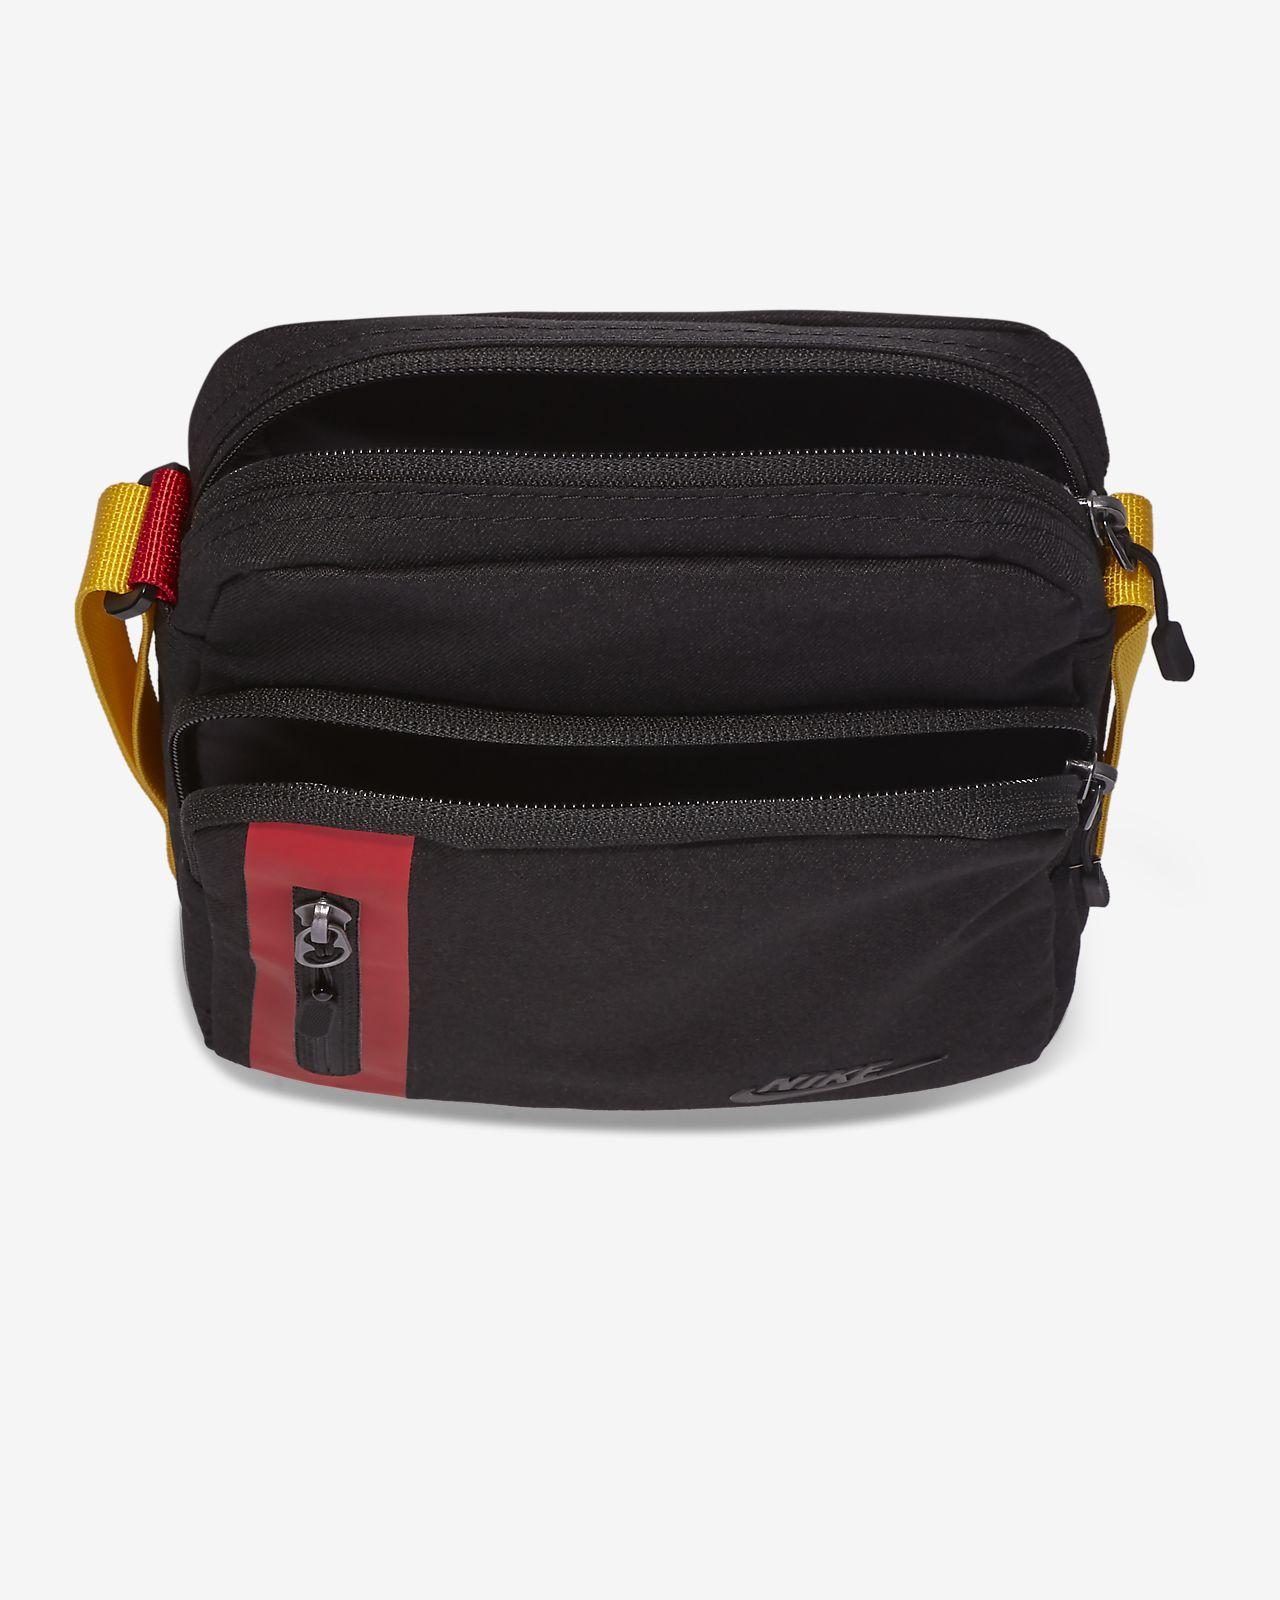 free shipping 7ec96 9c39a Nike Core Small Items 3.0